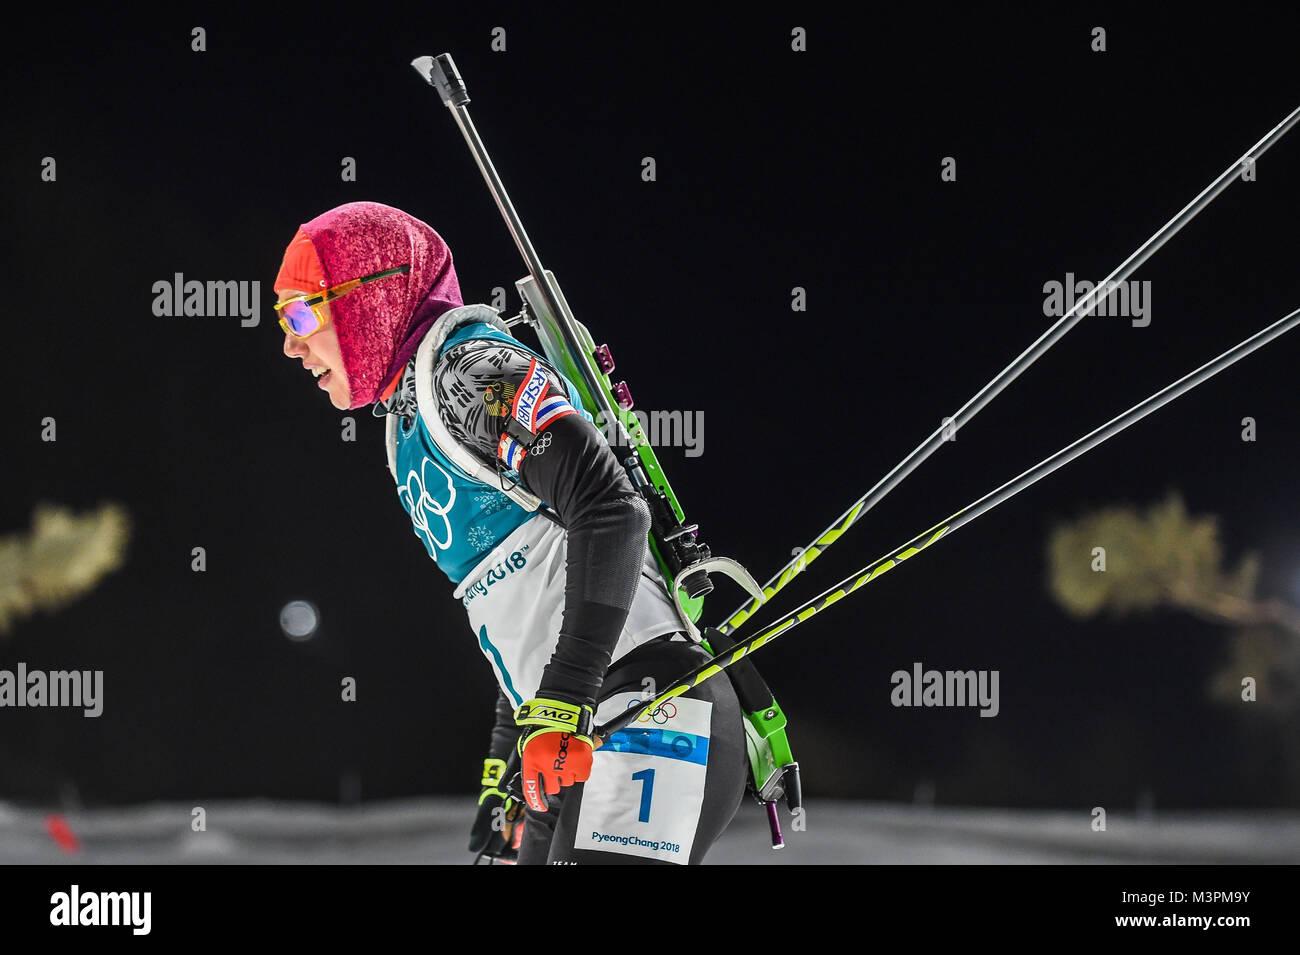 Pyeongchang, Südkorea. Februar 12, 2018: Laura Dahlmeier von Deutschland bei Frauen 10 km Verfolgung, Biathlon Stockbild